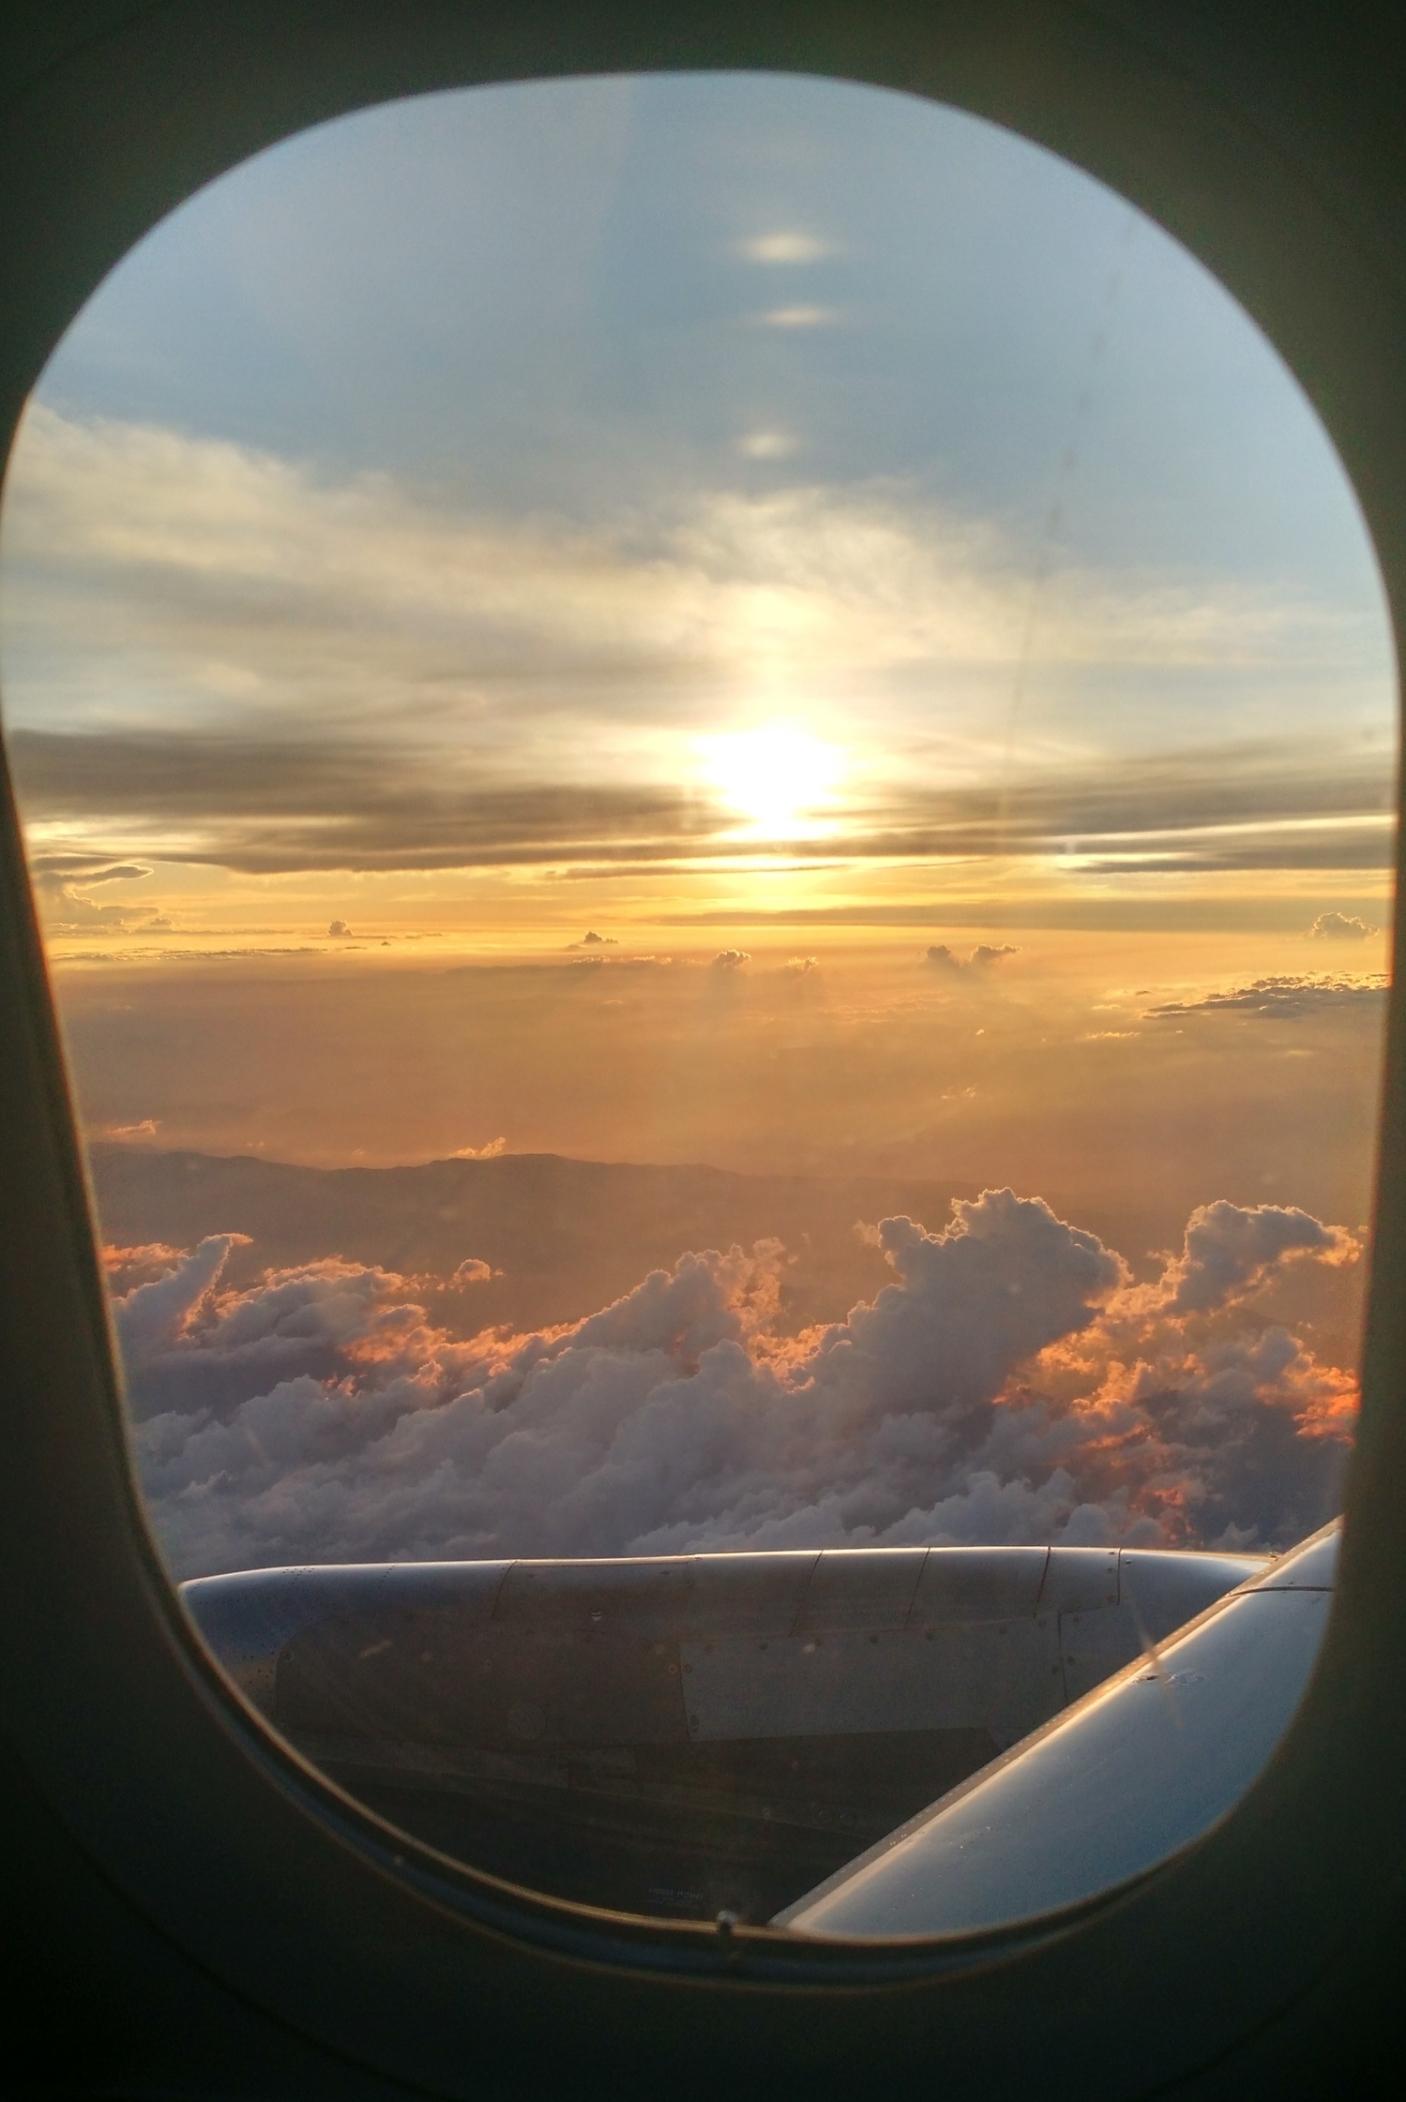 On my flight to Bogotá